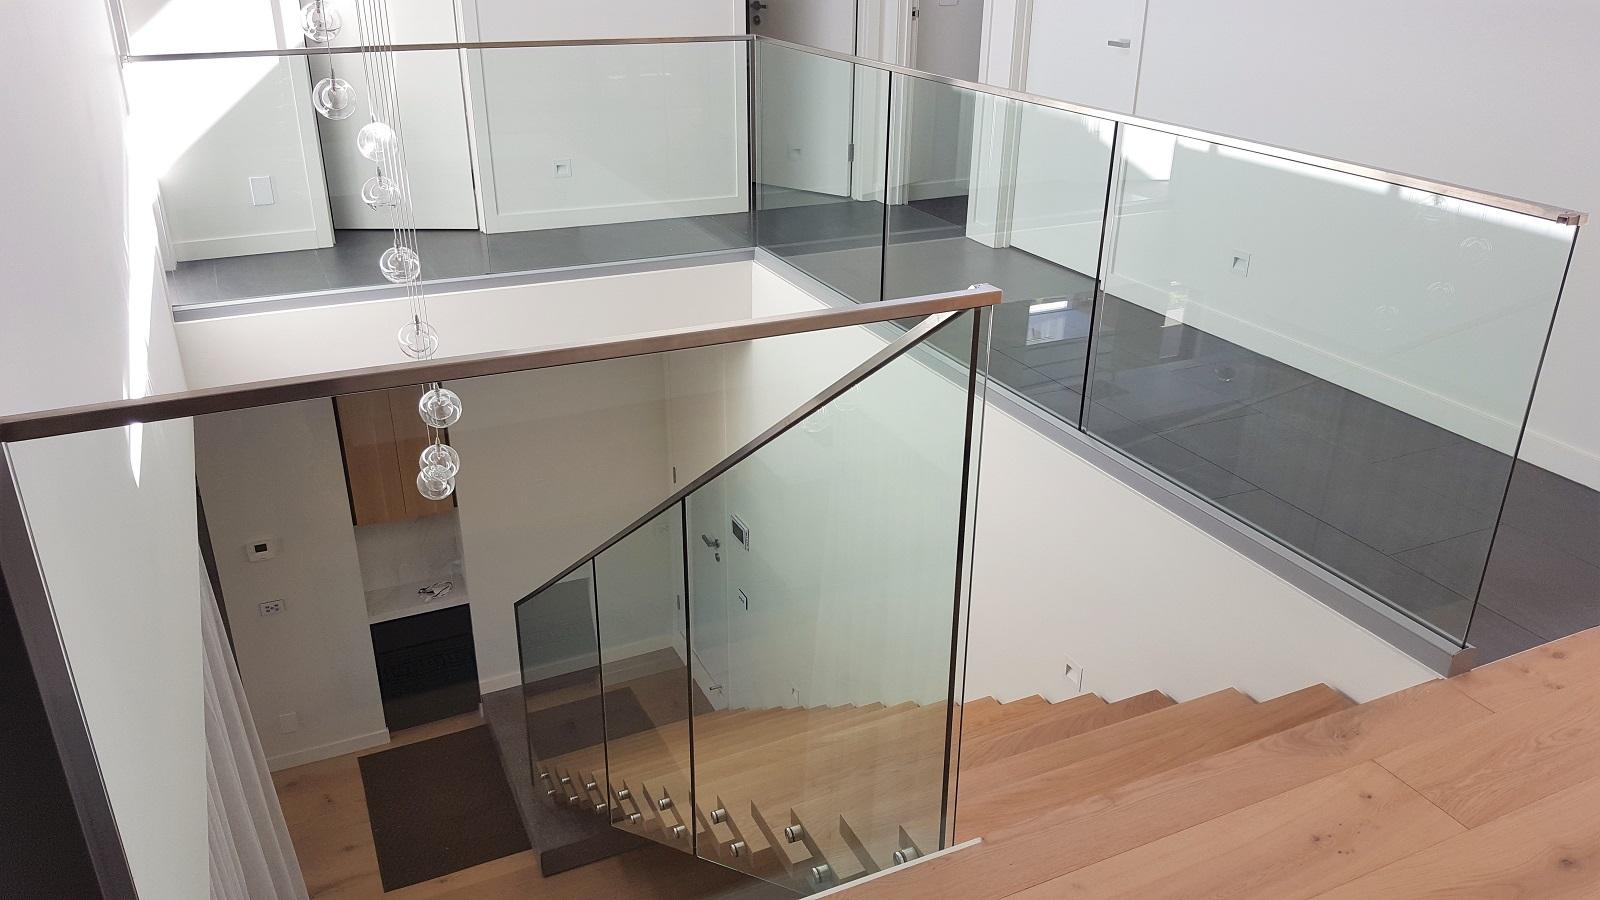 GA and CH series glass balustrade - Beaumaris 1600x900.jpg